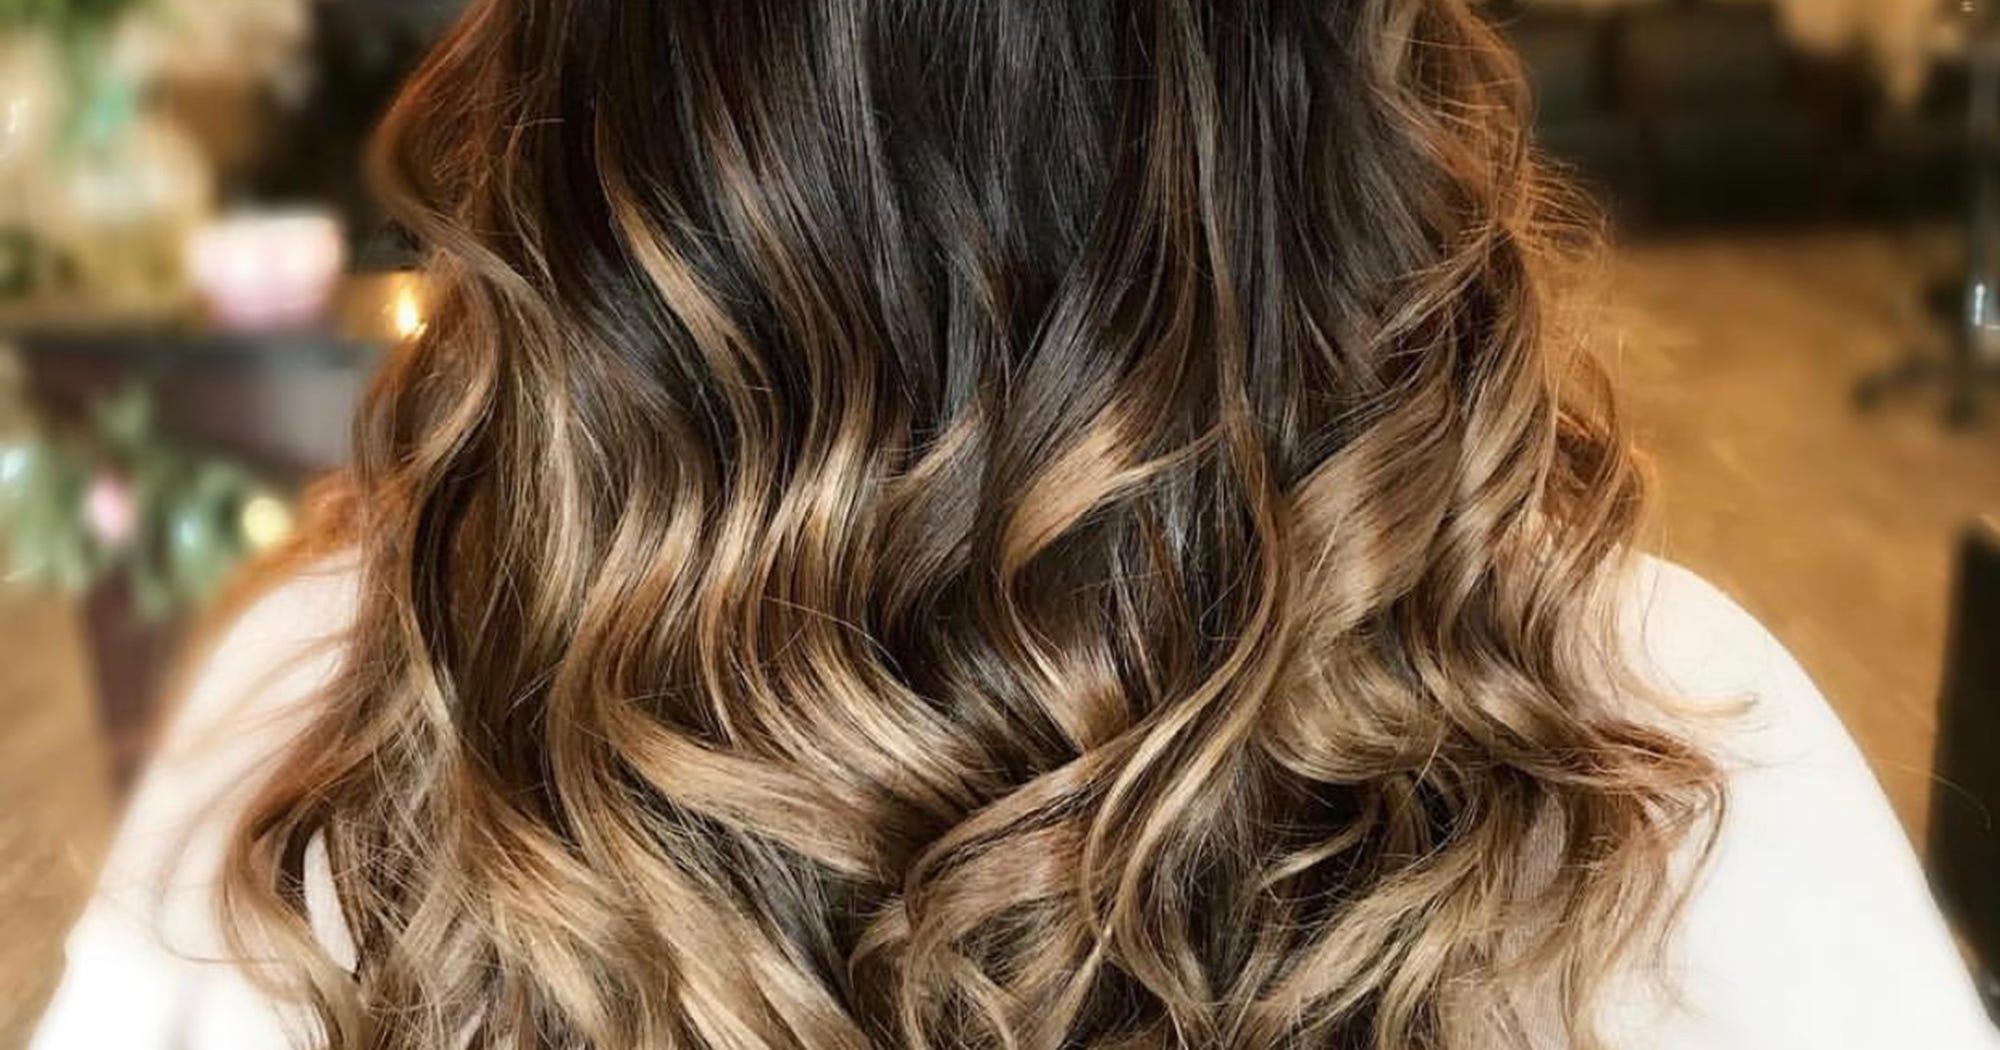 Hair Highlights - Tips, Tricks, DIY